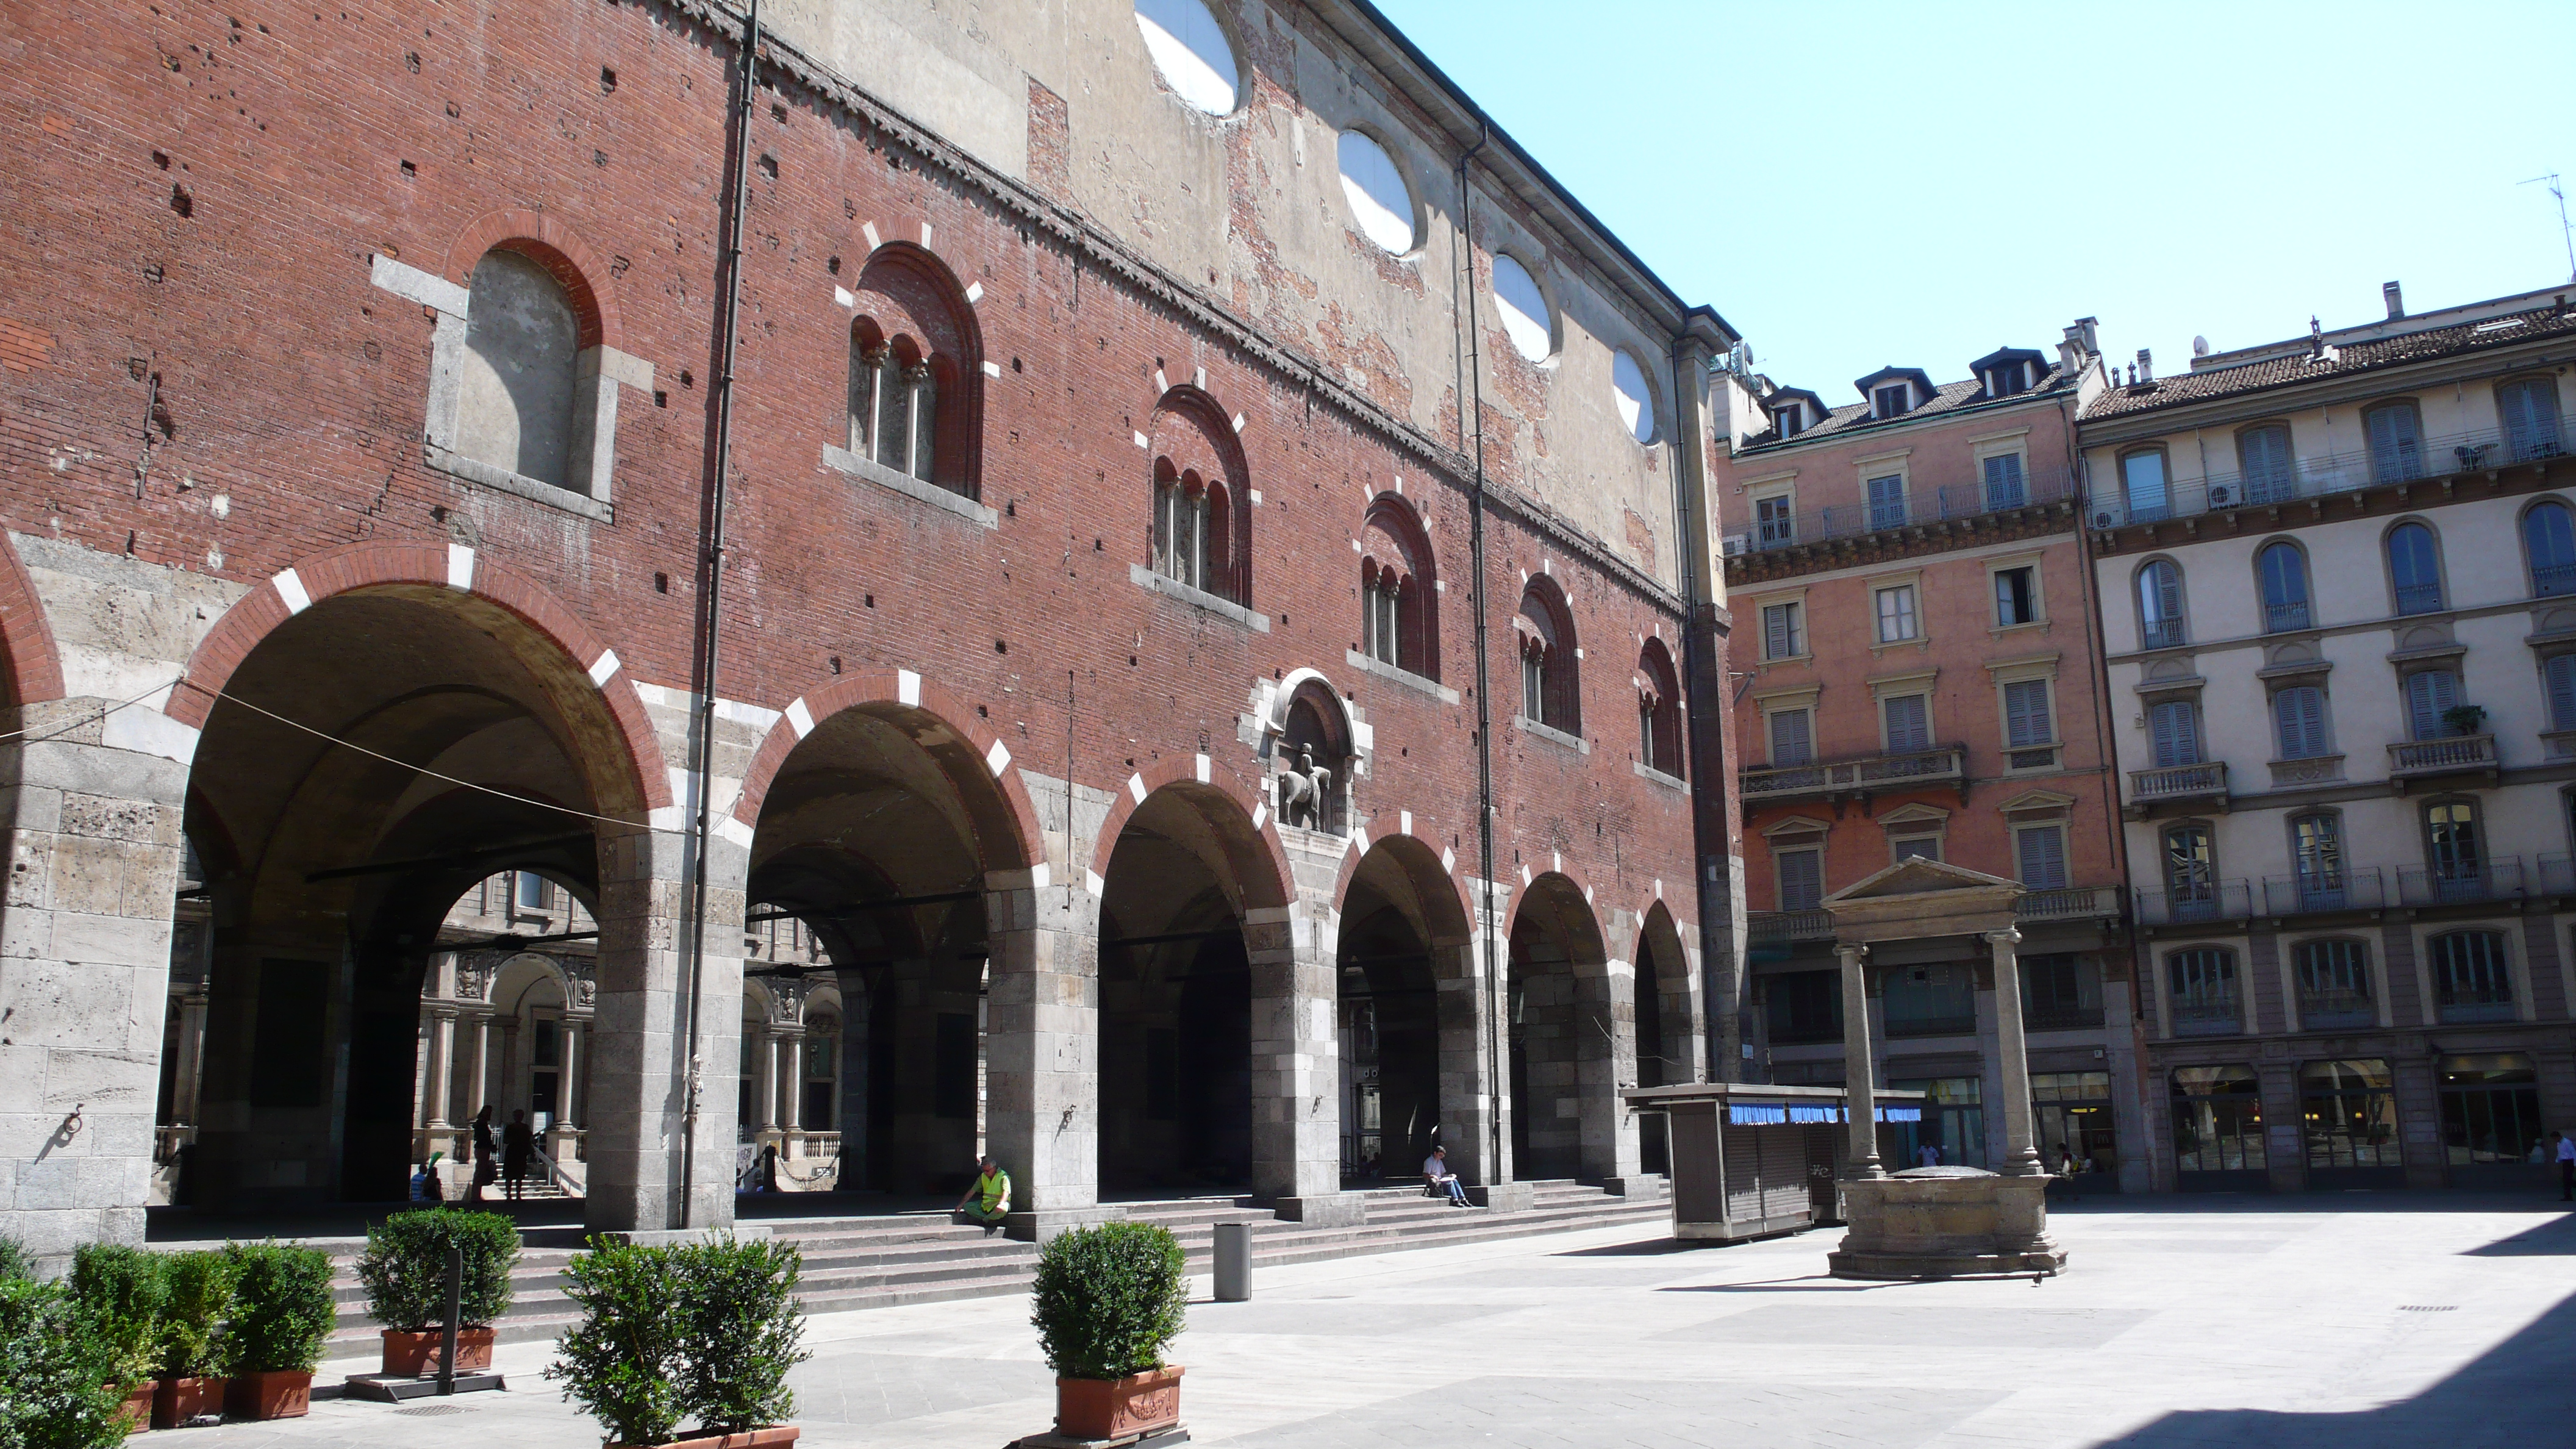 Imagini pentru Piazza Mercanti Milano wikipedia